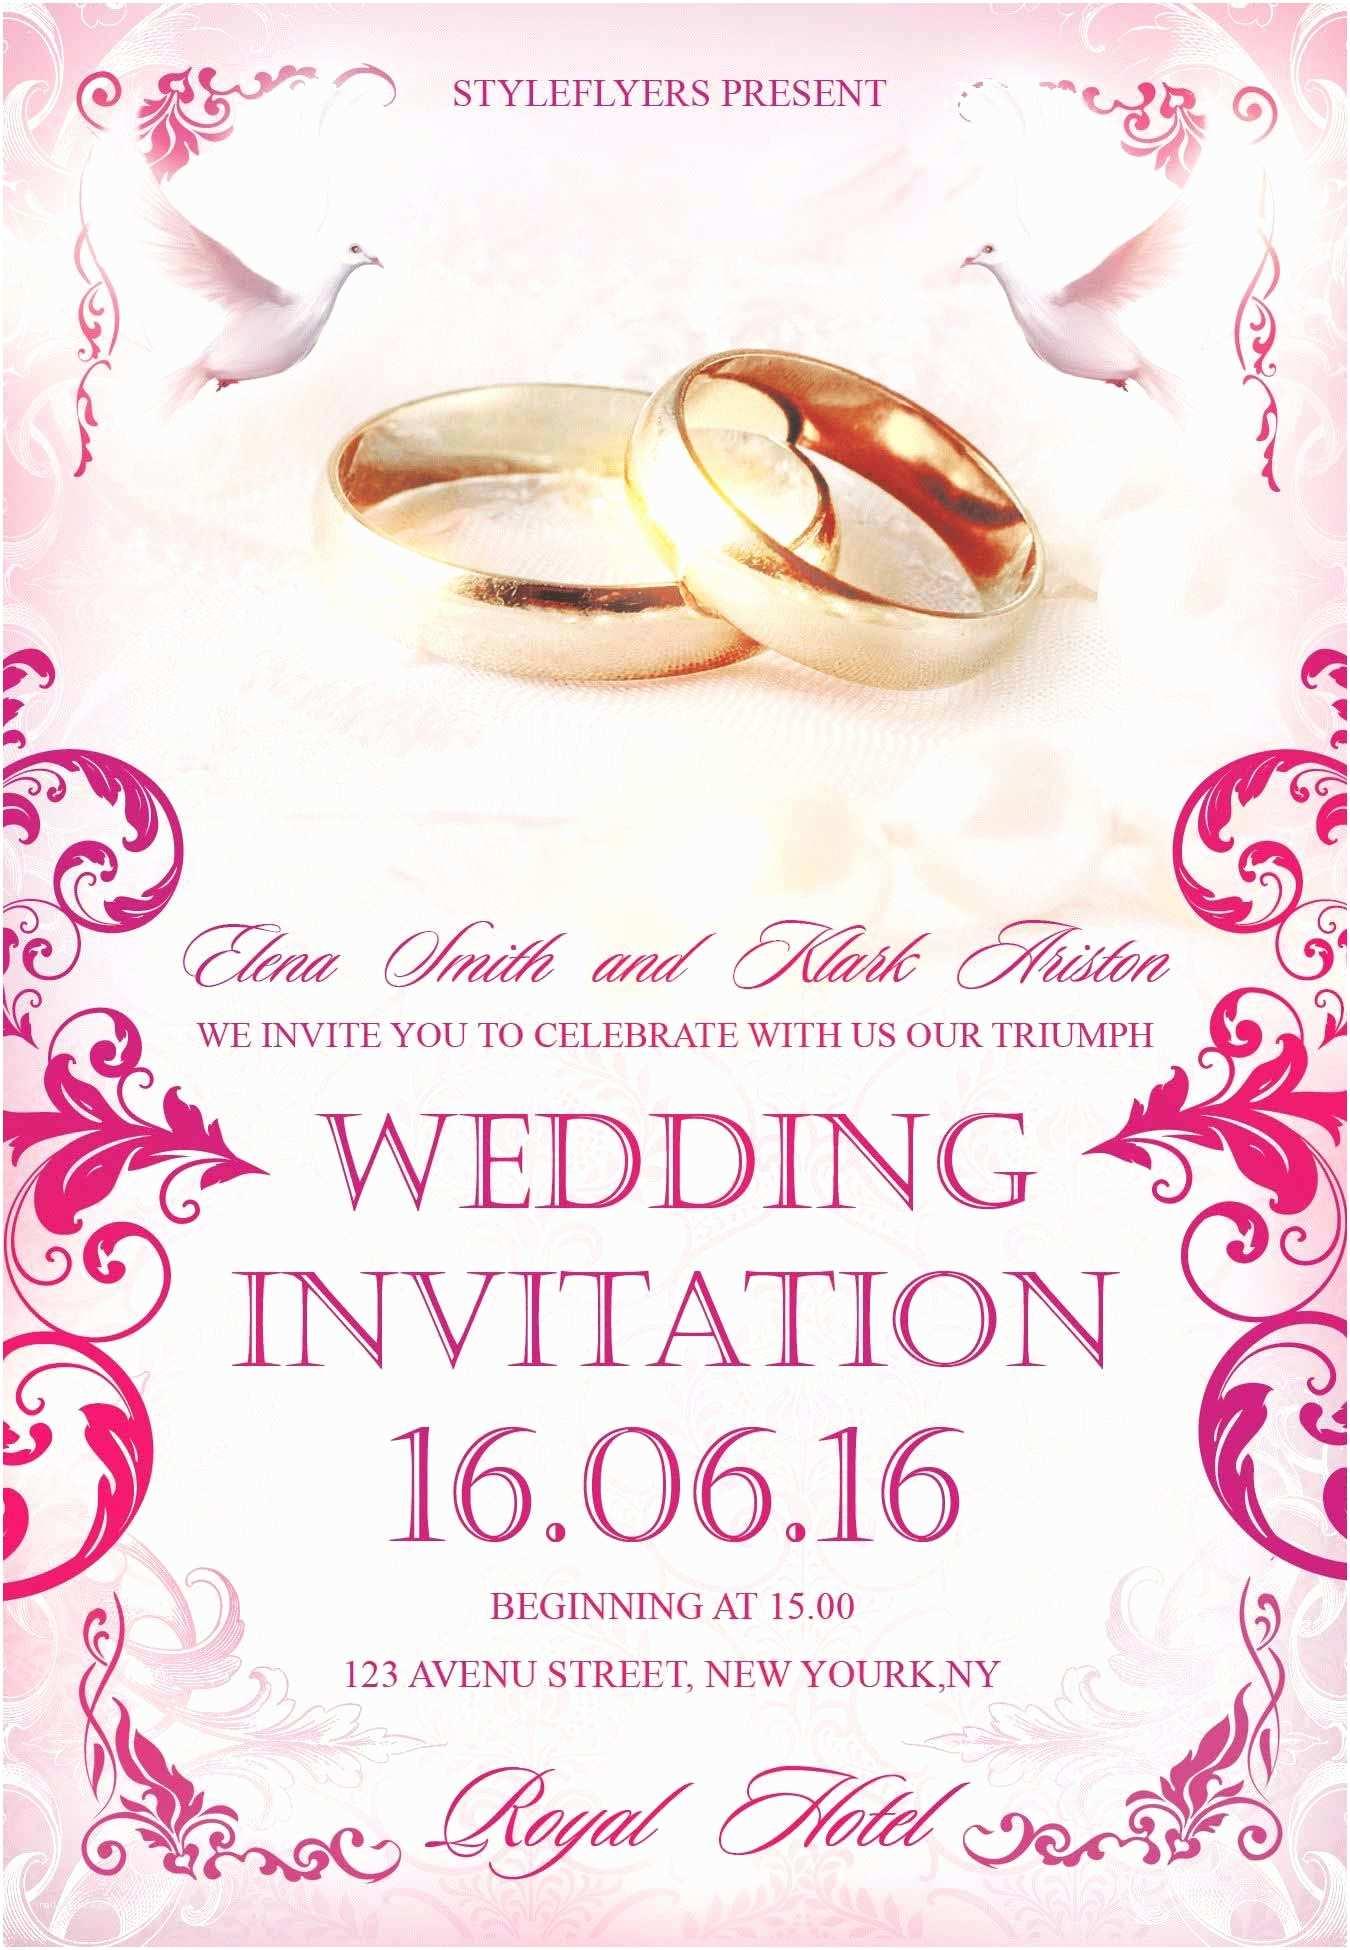 Wedding Invitation Flyer Template Old Fashioned Invitation Flyer Template Vignette Simple